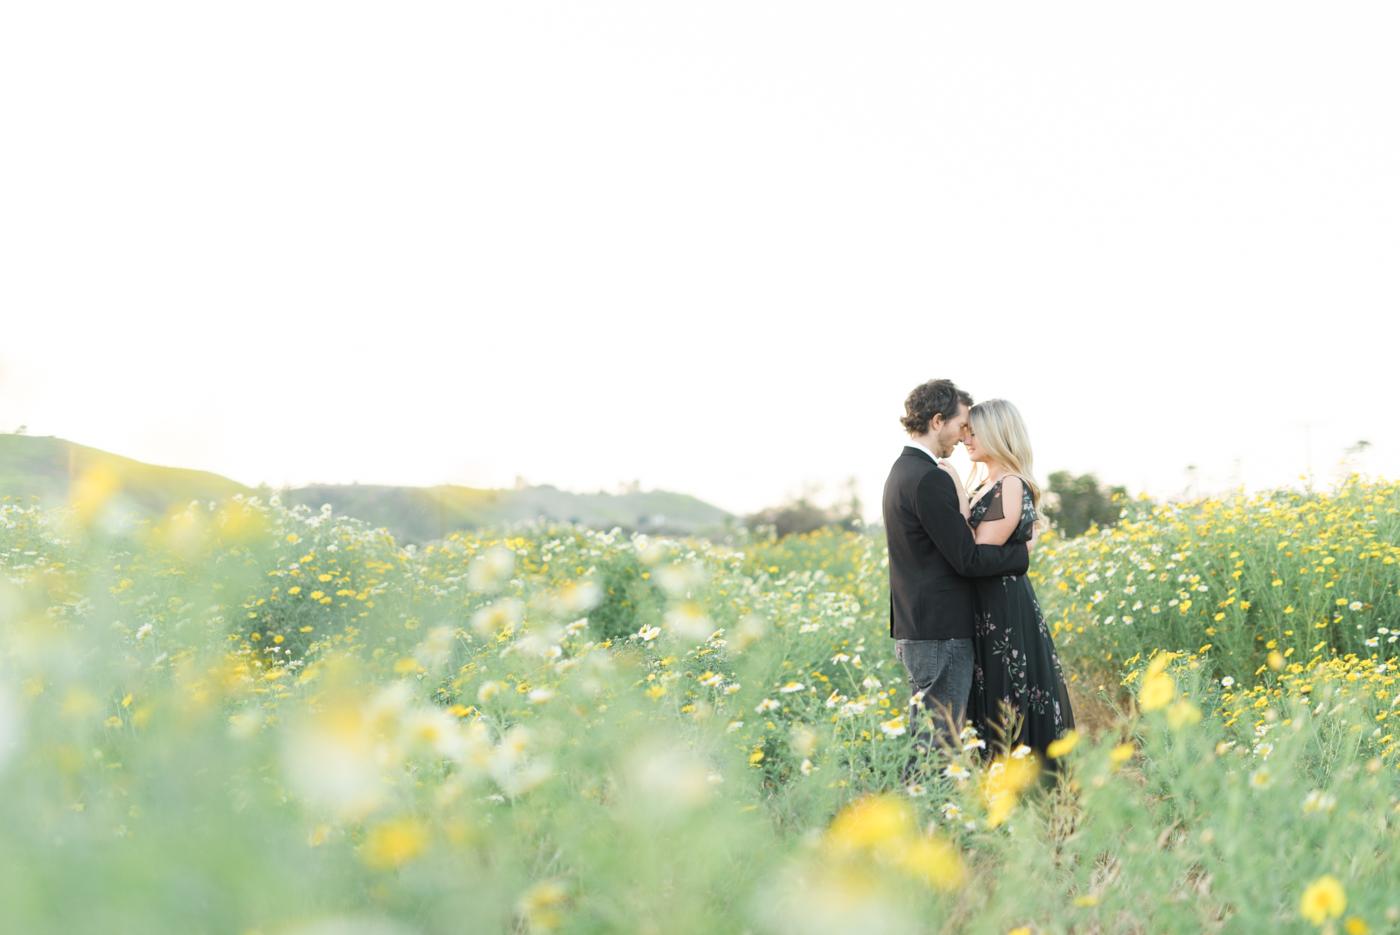 San_Juan_Capistrano_Goldendoodle_family_portrait_session_los_angeles_wedding_photographer-18.jpg